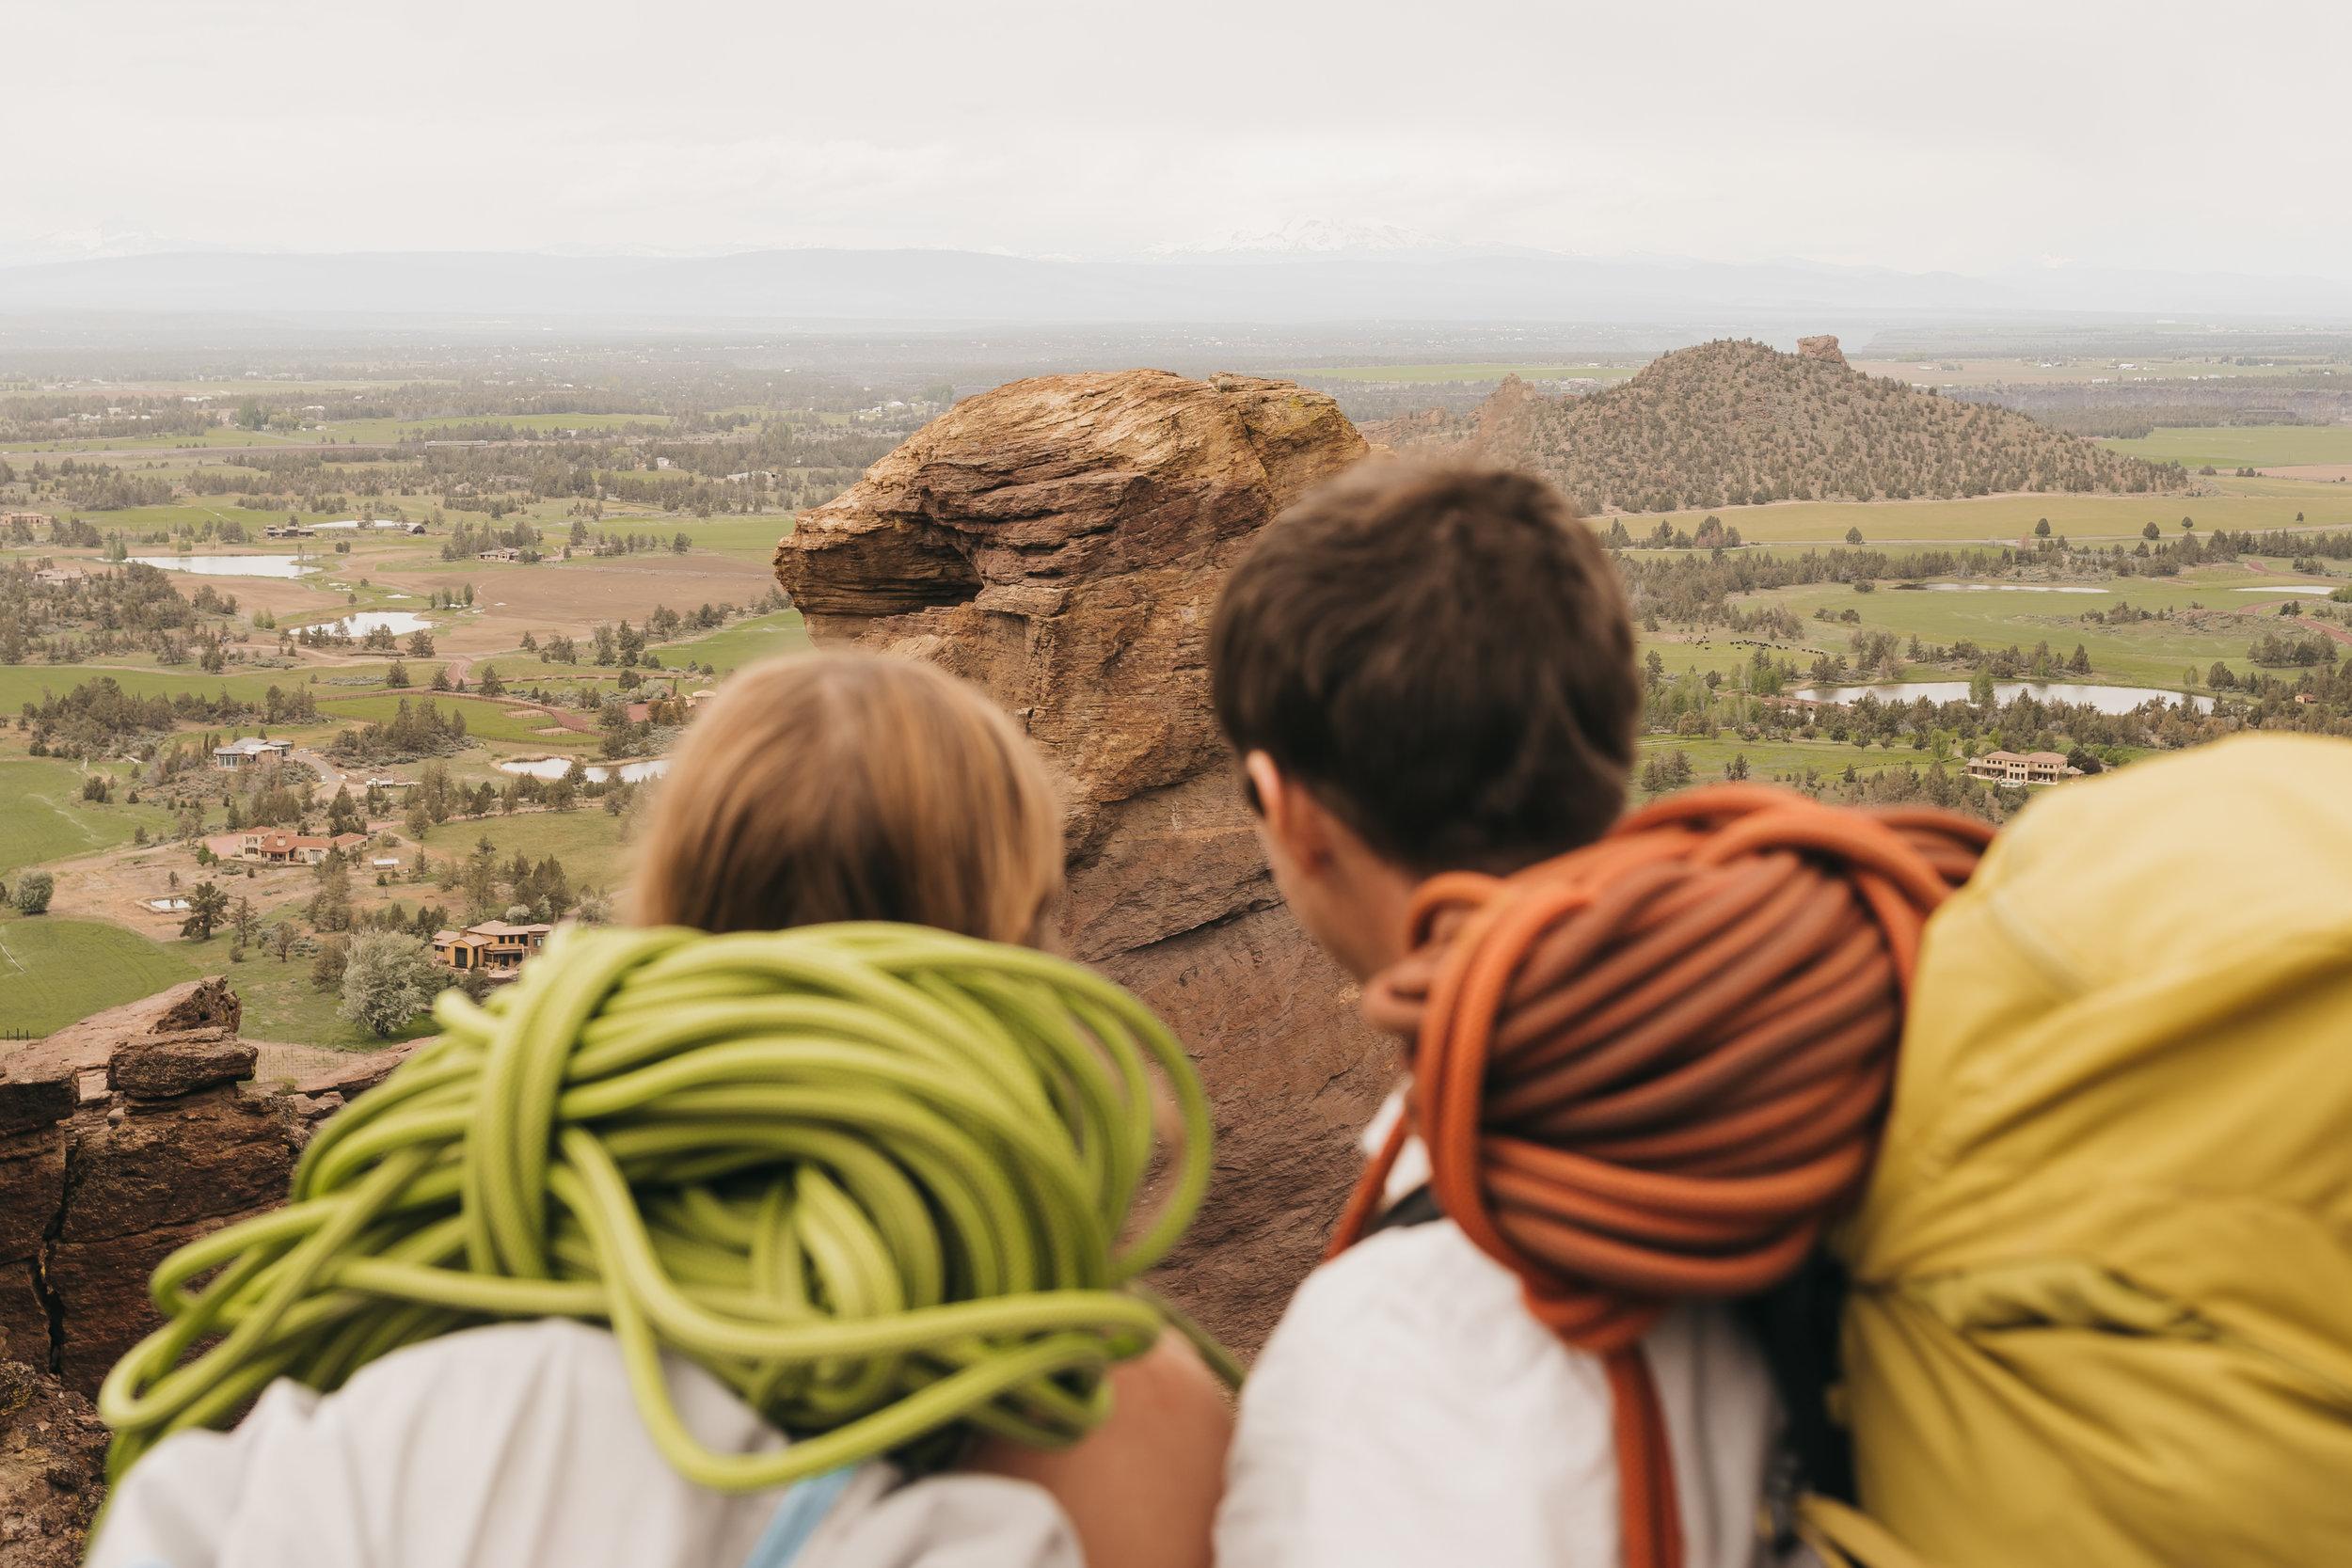 Smith Rock Climbing Elopement | Between the Pine Adventure Elopement Photography